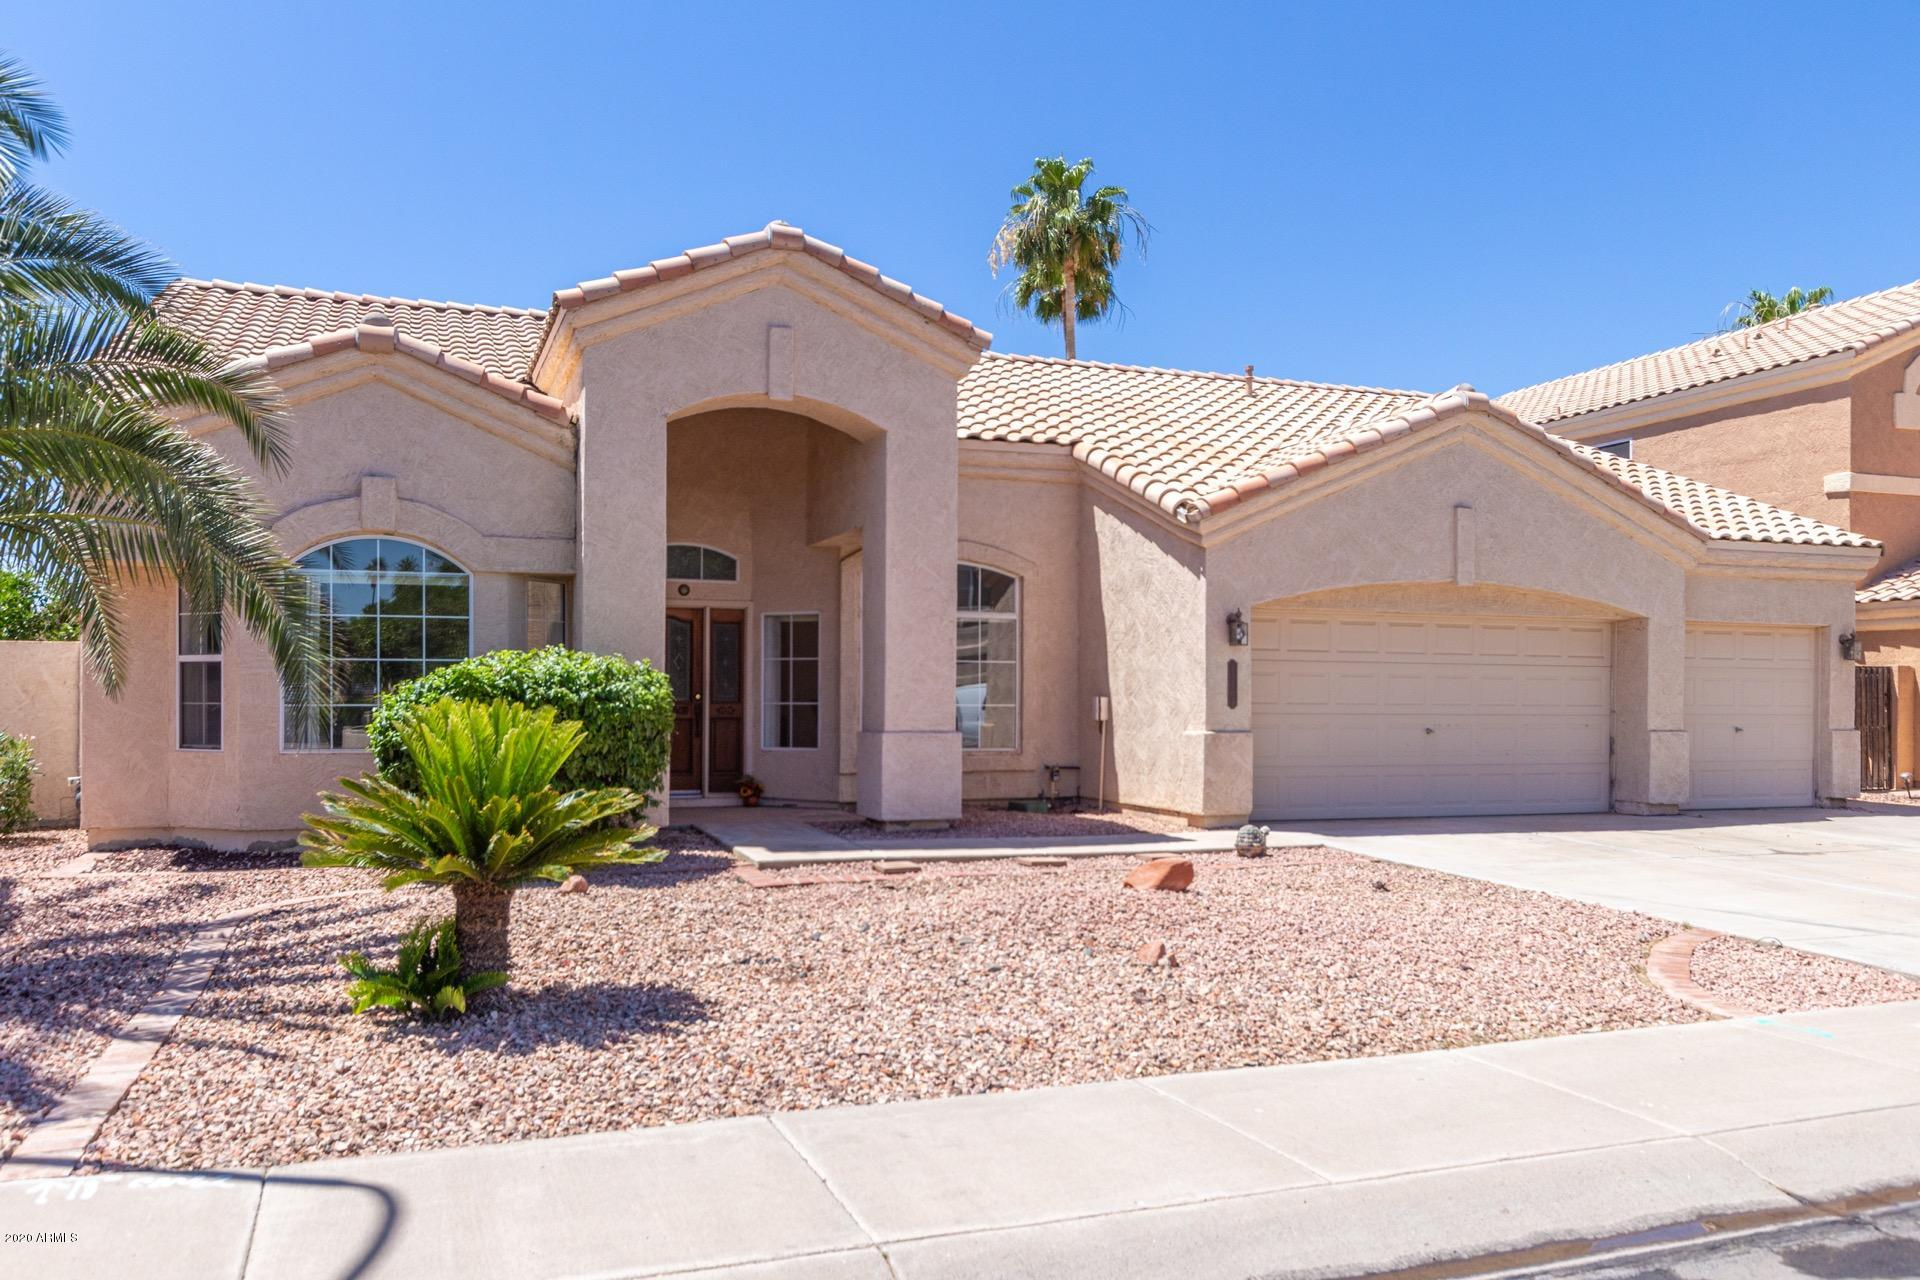 Photo of 11107 W Citrus Grove Way, Avondale, AZ 85392